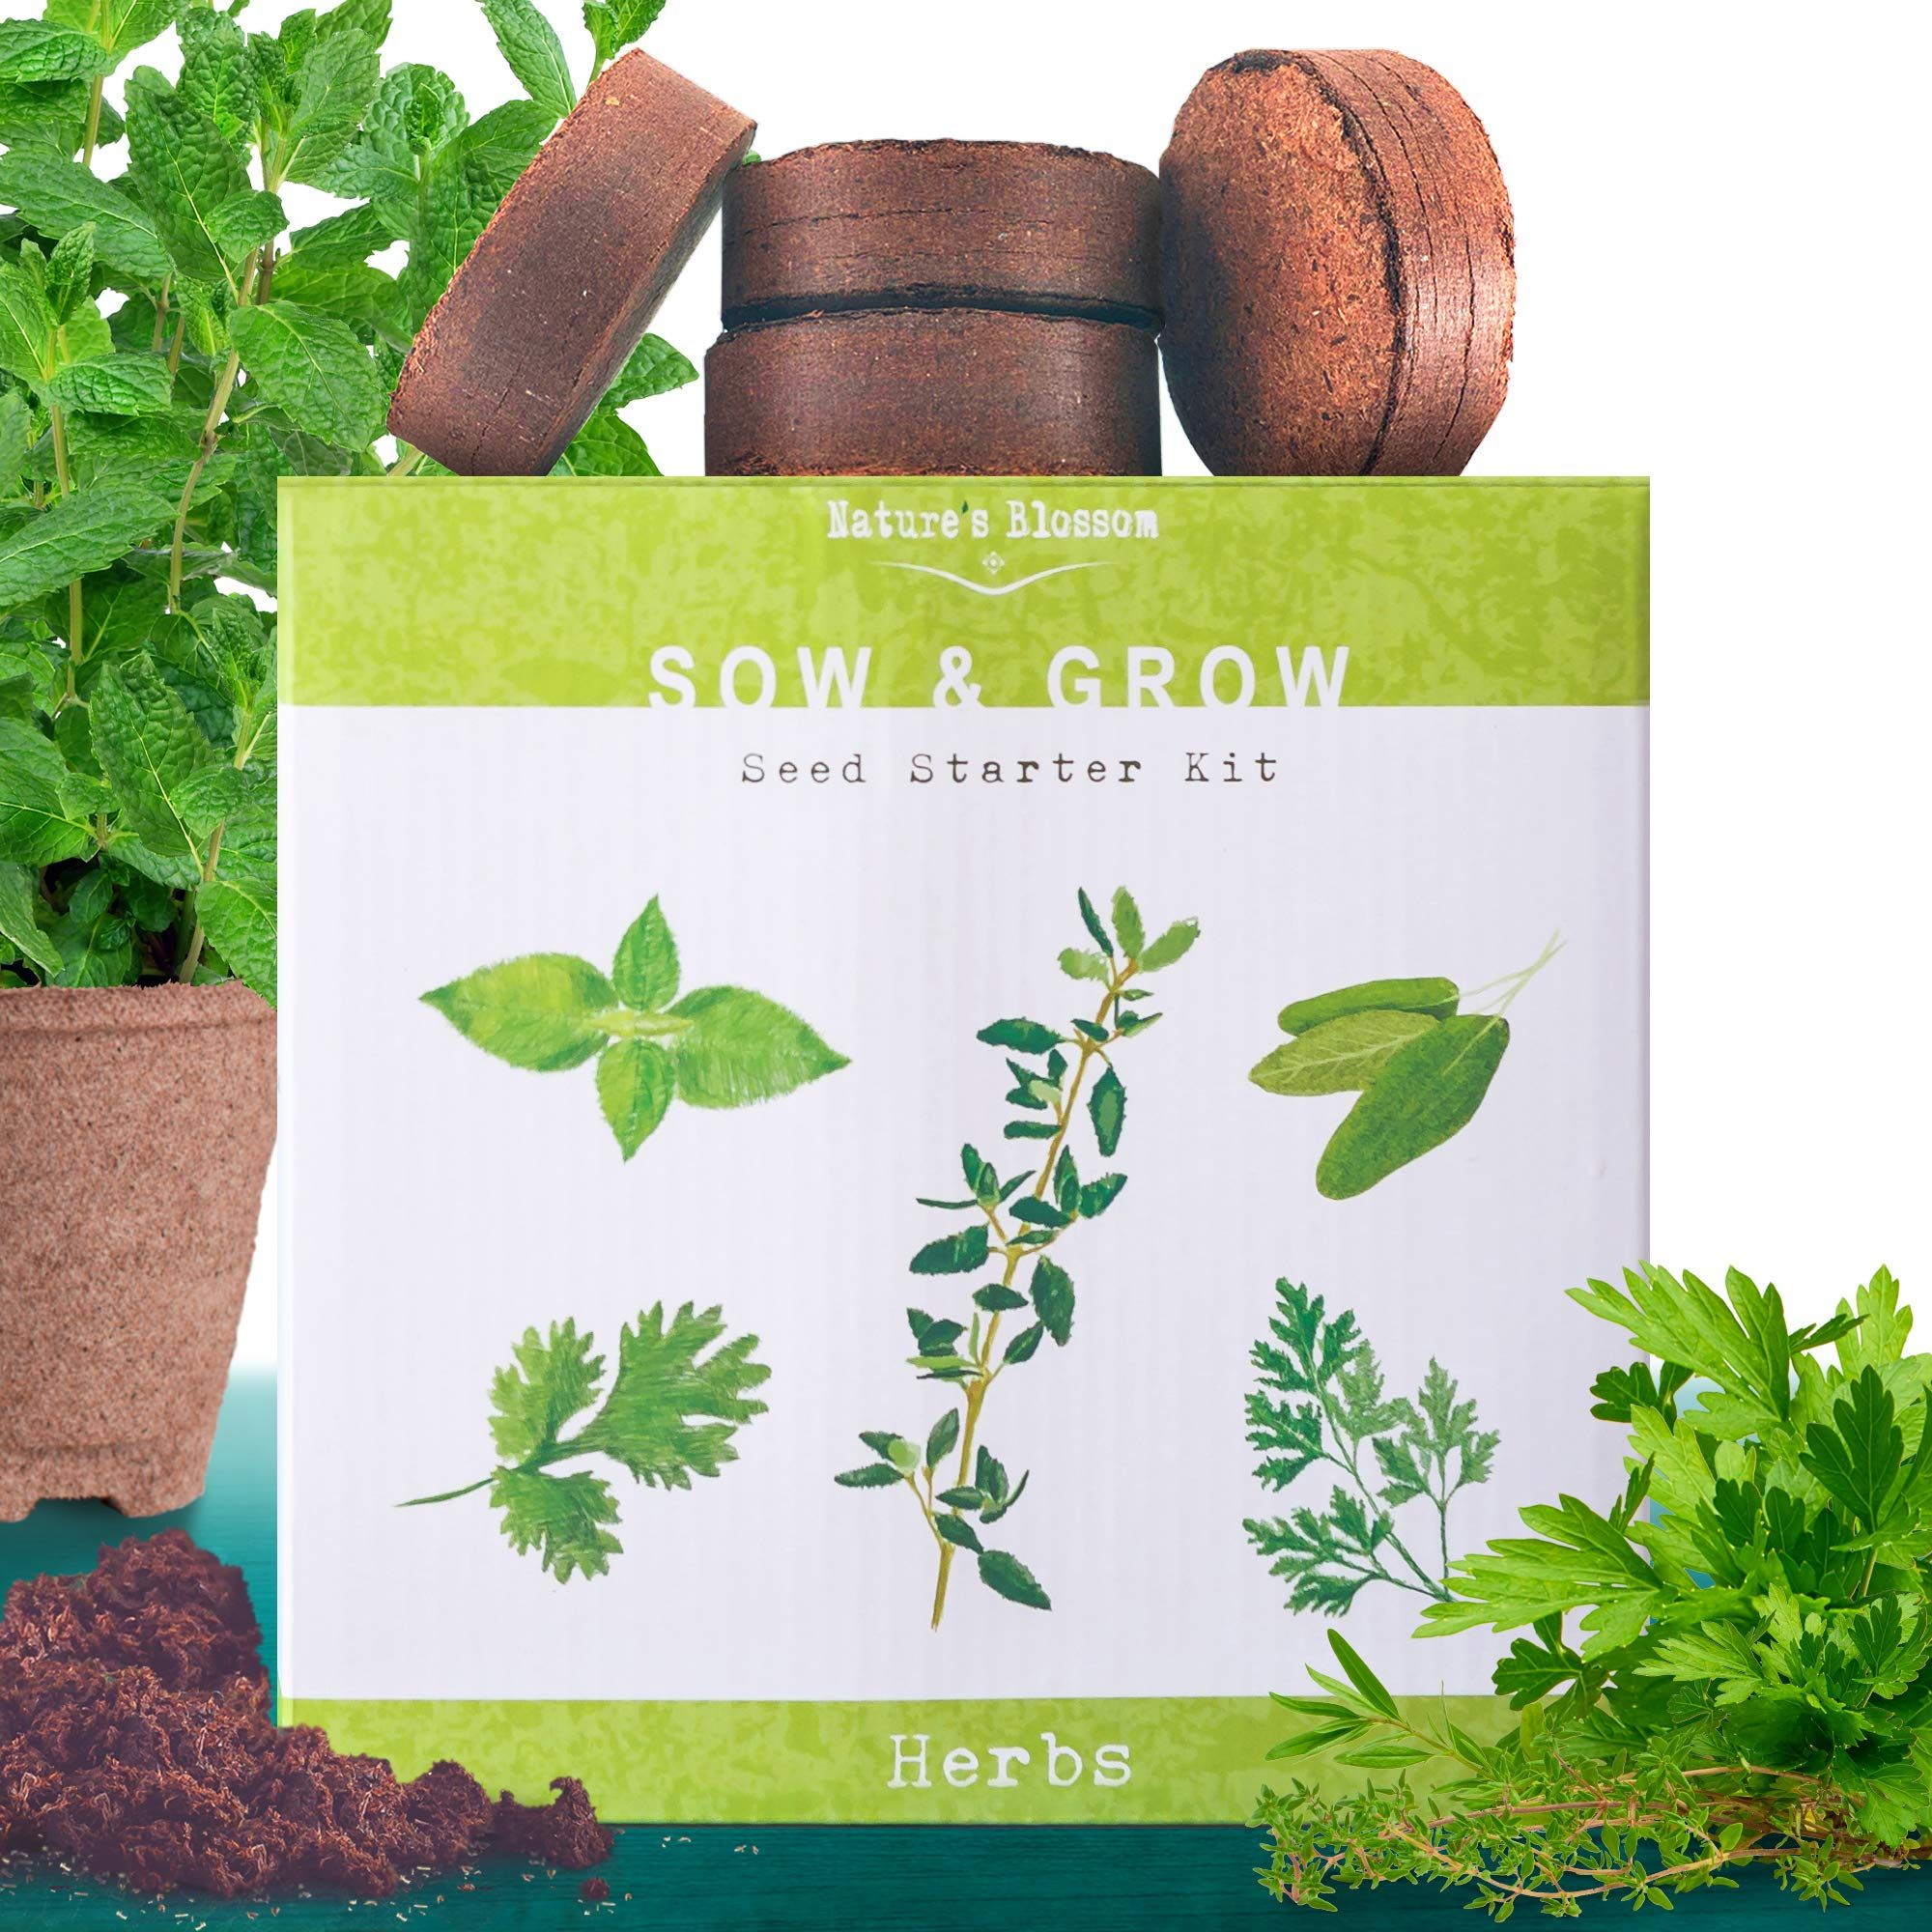 Nature's Blossom Indoor Herb Garden Starter Kit with 5